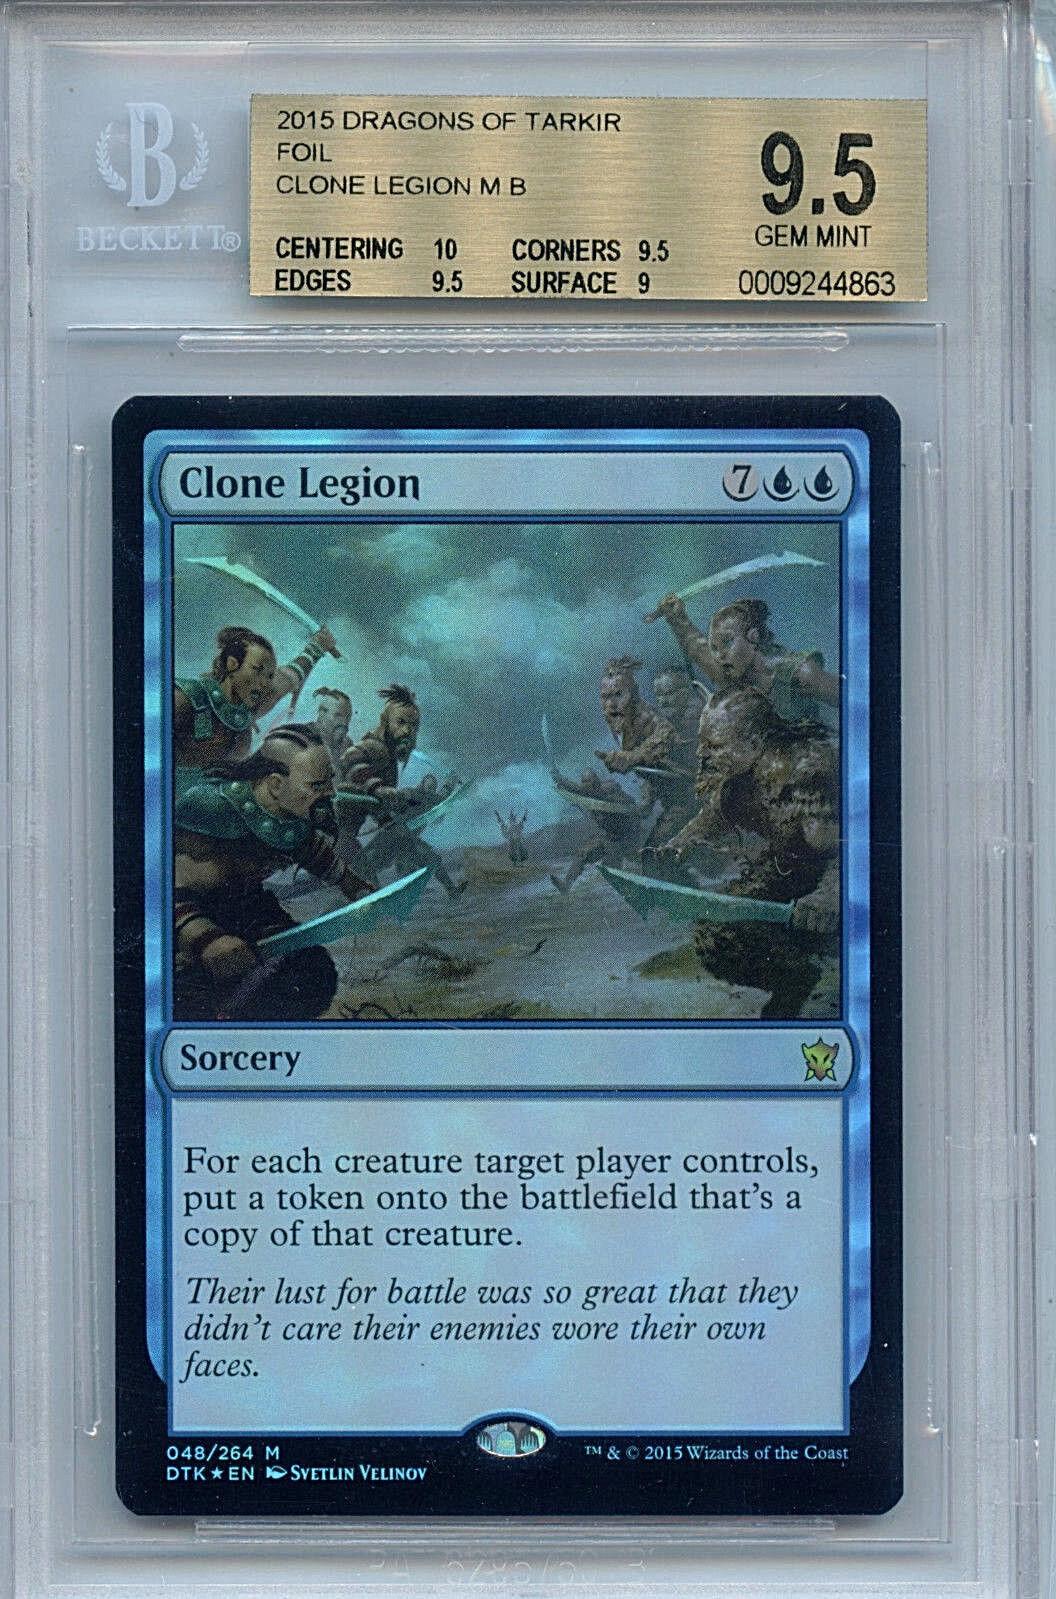 MTG Clone Clone Clone Legion BGS 9.5 GM Dragons Tarkir Mystic Foil Magic Card Amricons 5fd2f3